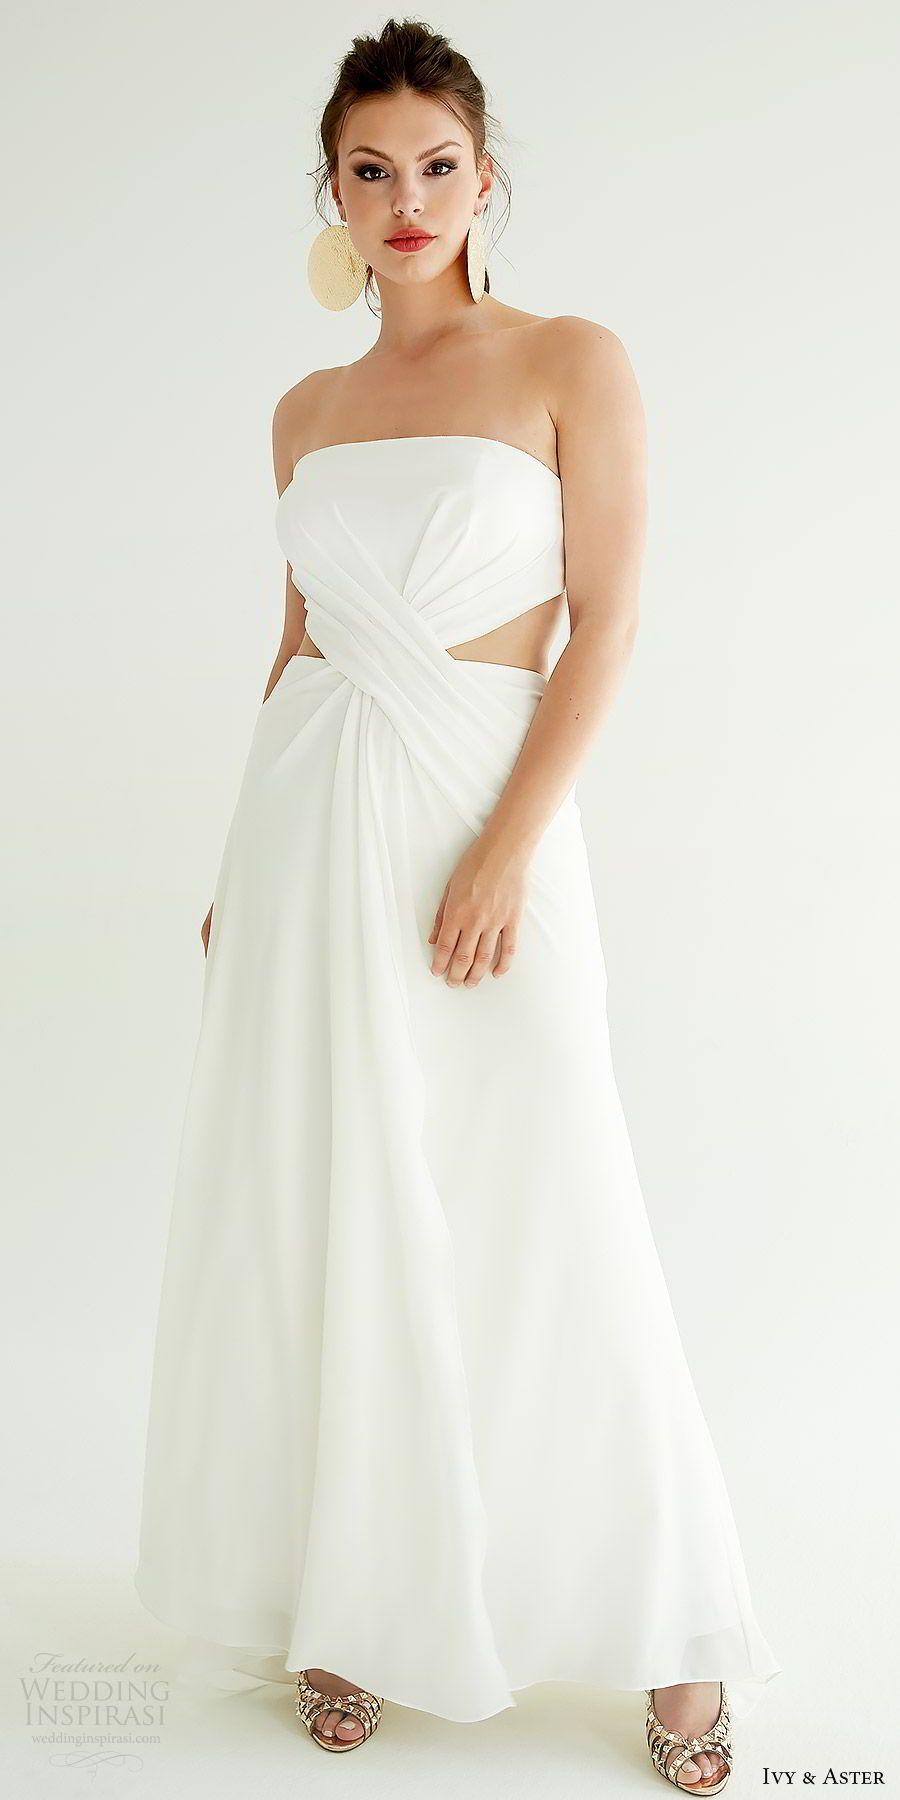 Ivy Aster Spring 2019 Wedding Dresses Ixa Revolution Bridal Collection Wedding Inspirasi Short Wedding Gowns Chic Wedding Dresses Embellished Wedding Dress [ 1800 x 900 Pixel ]